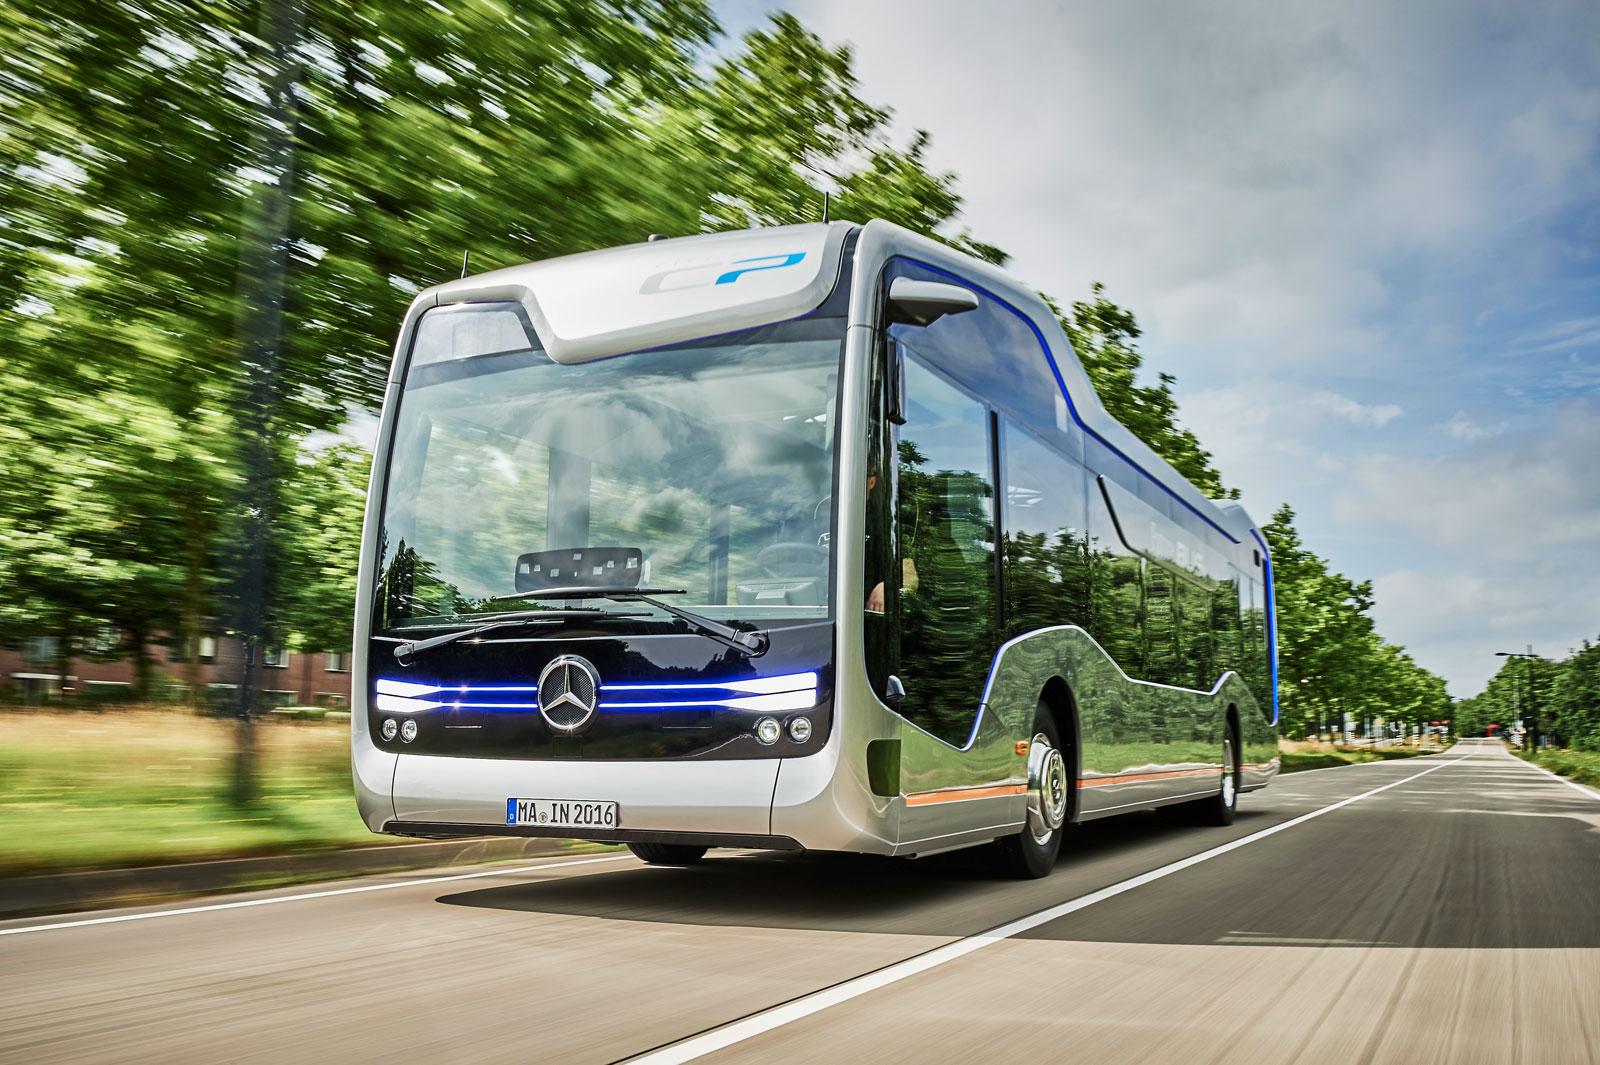 Mercedes benz future bus concept car body design for Mercedes benz transit